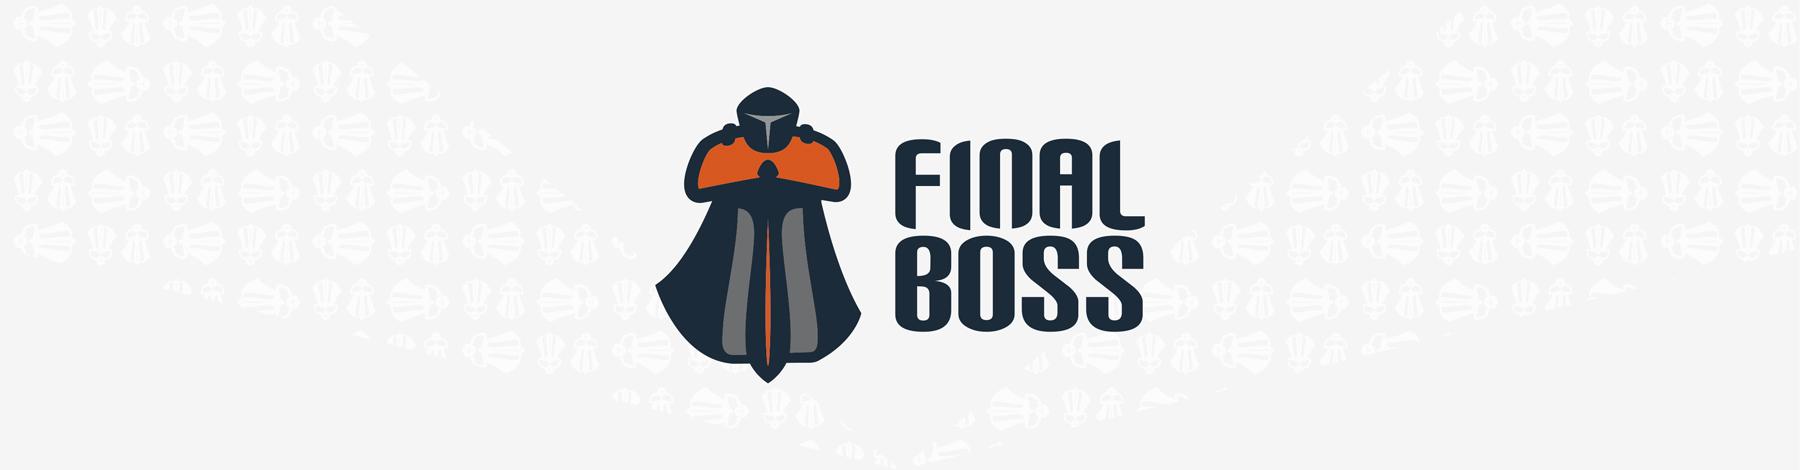 Final_Boss_Slide3